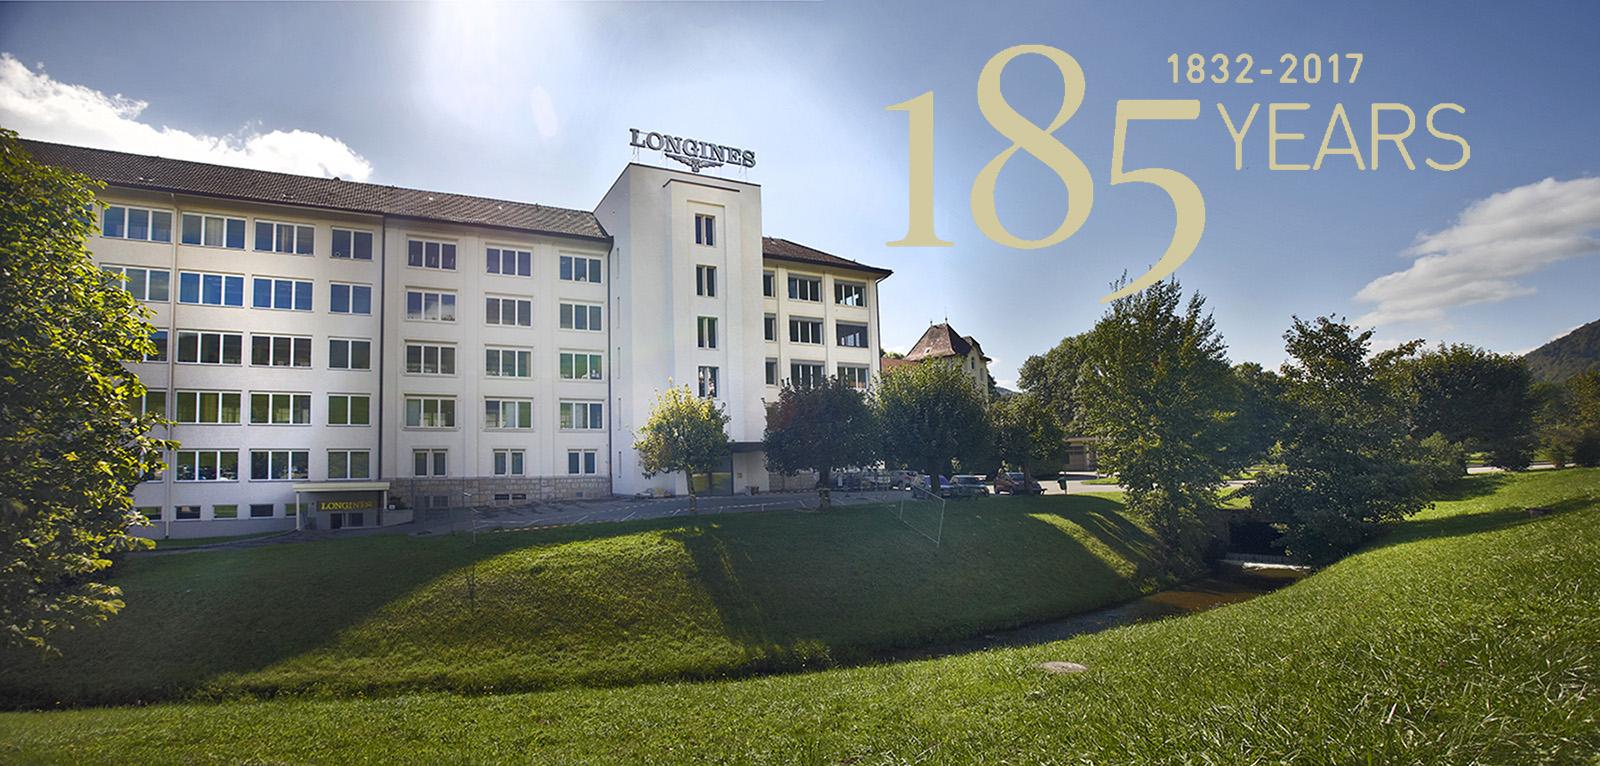 Longines 185 aniversario-0